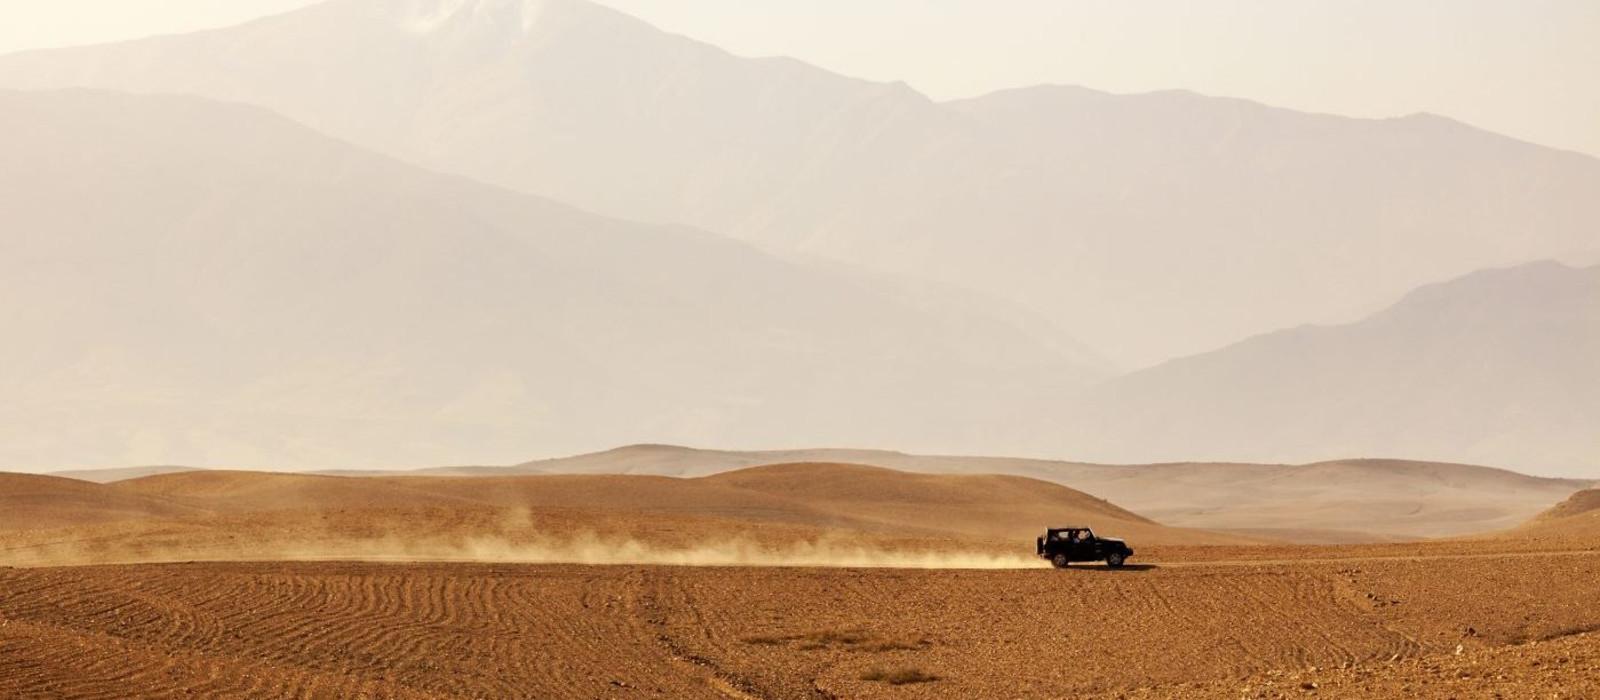 Reiseziel Agafay Wüste Marokko